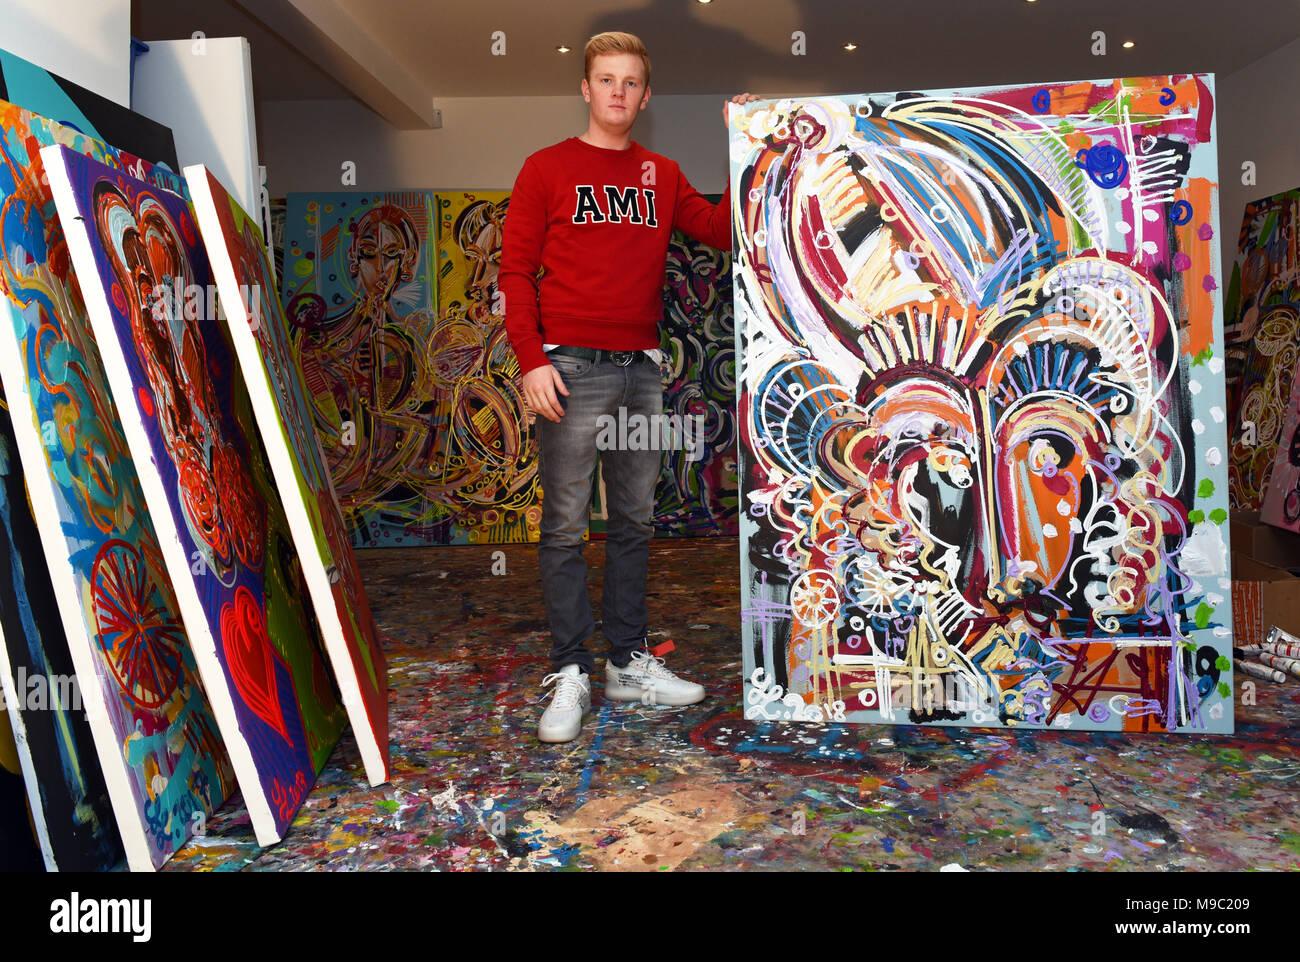 Maler Meerbusch horst stockfotos horst bilder seite 41 alamy